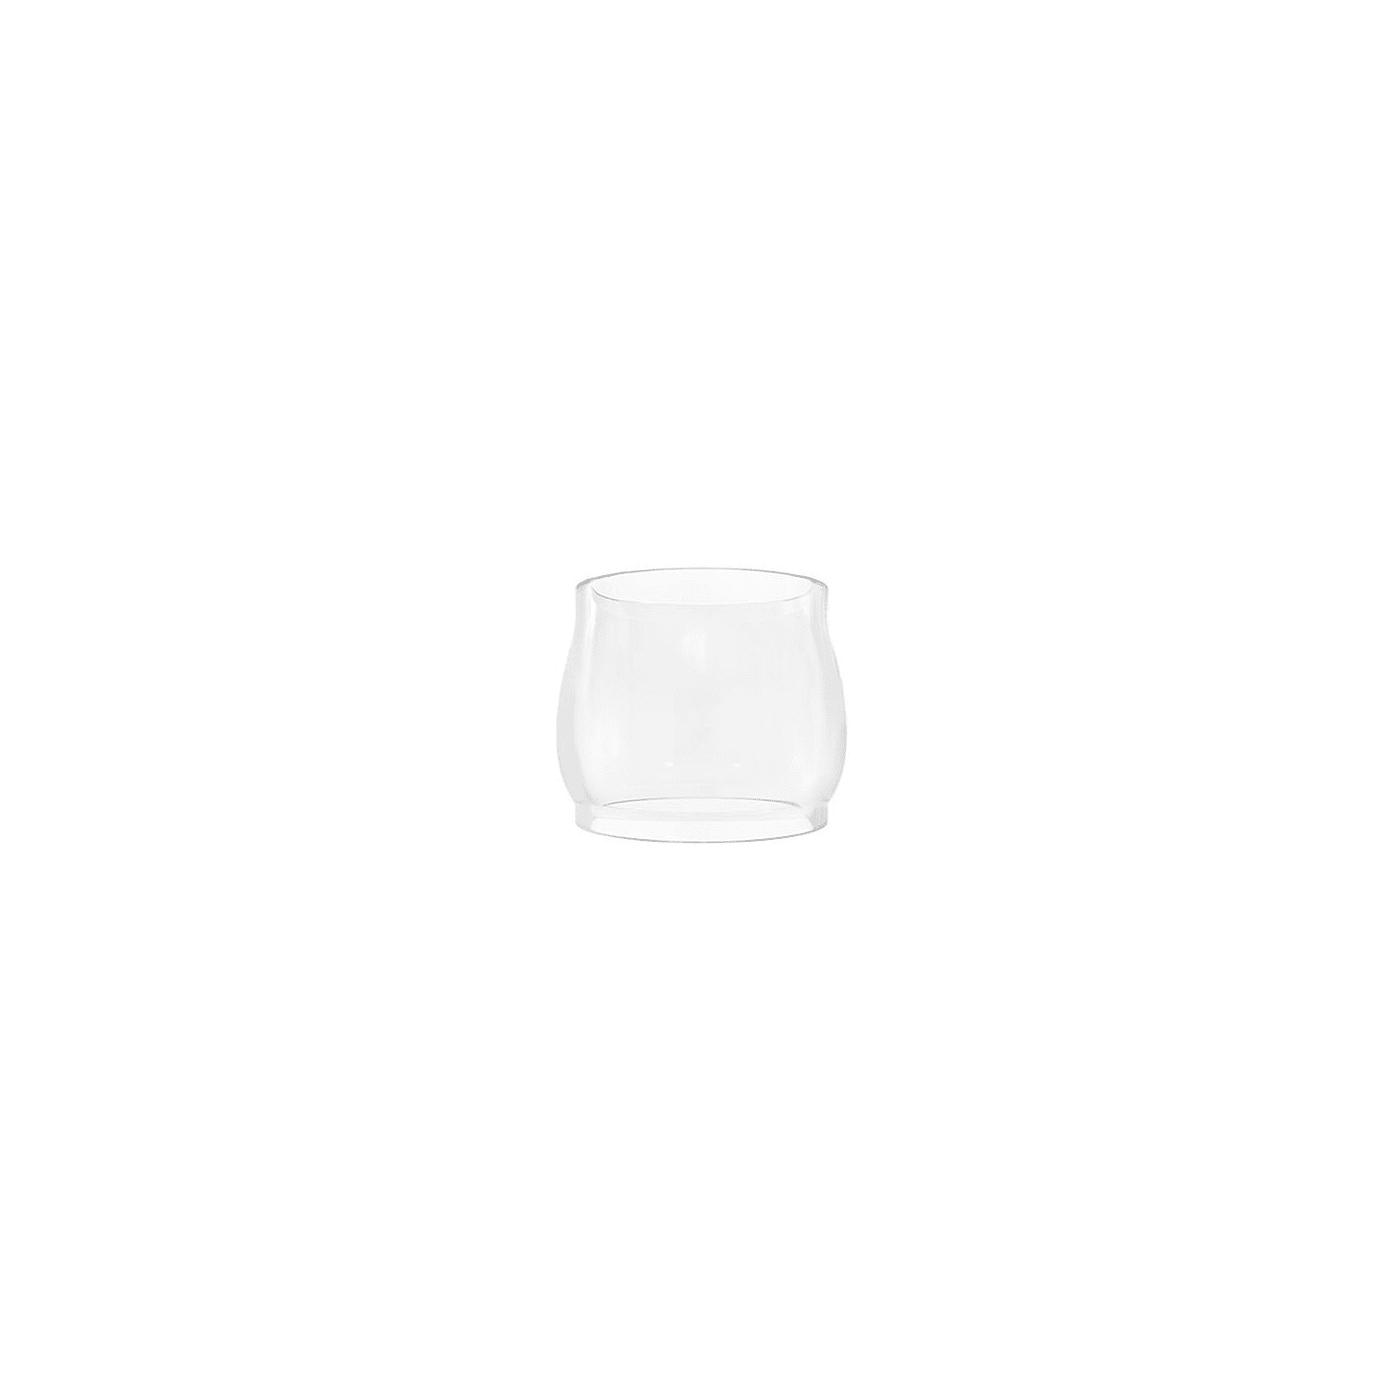 FreeMax M Pro Tank Replacement Glass